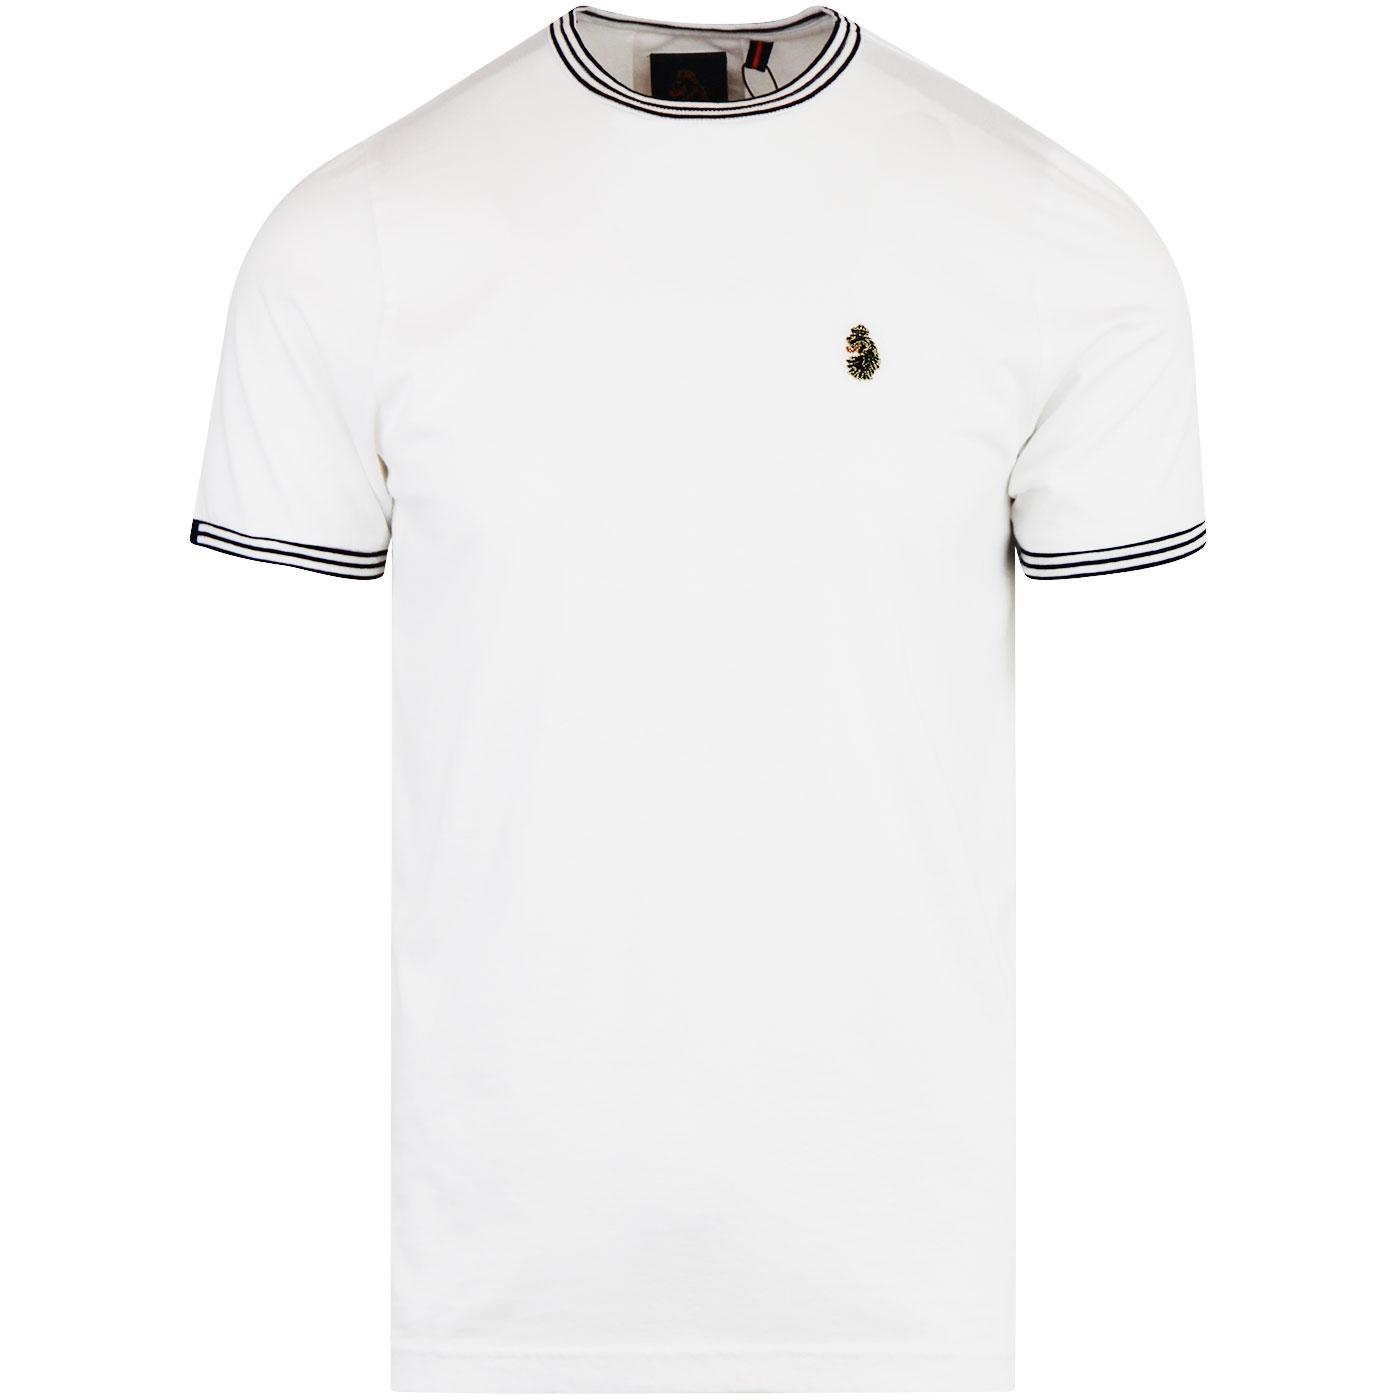 Traff 2 LUKE 1977 Crew Neck Sports T-Shirt WHITE